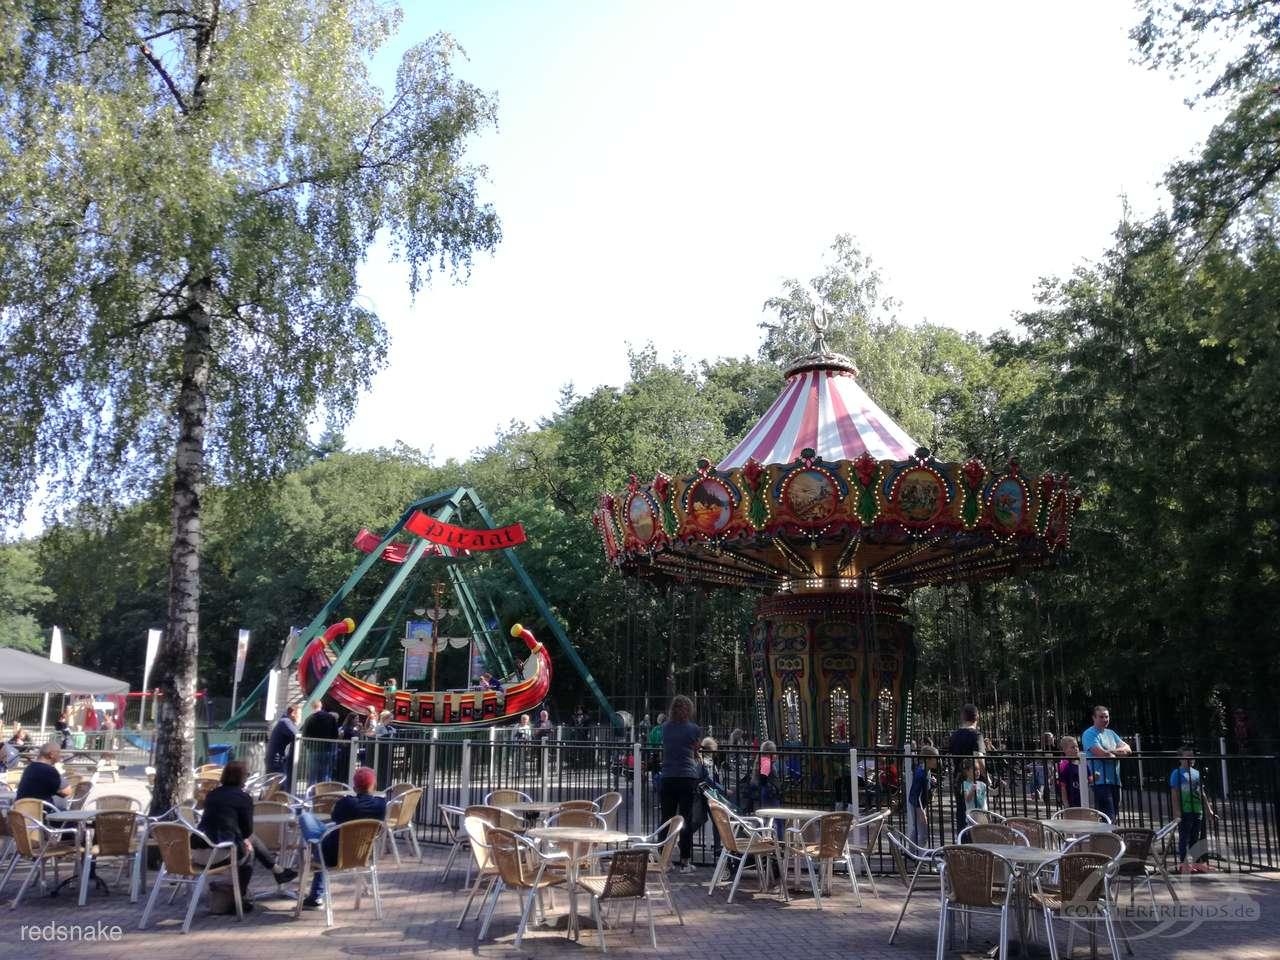 Drouwenerzand Attractiepark Impressionen